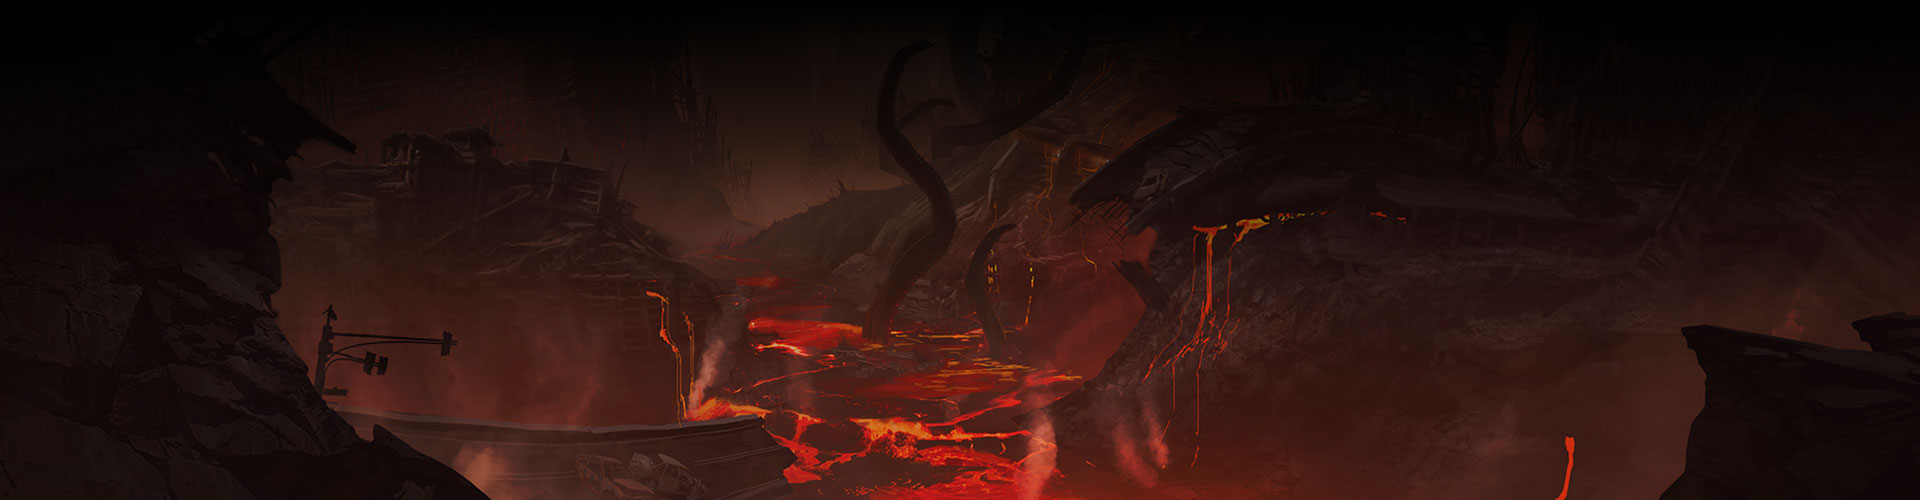 En ødelagt bro og bygninger med lava